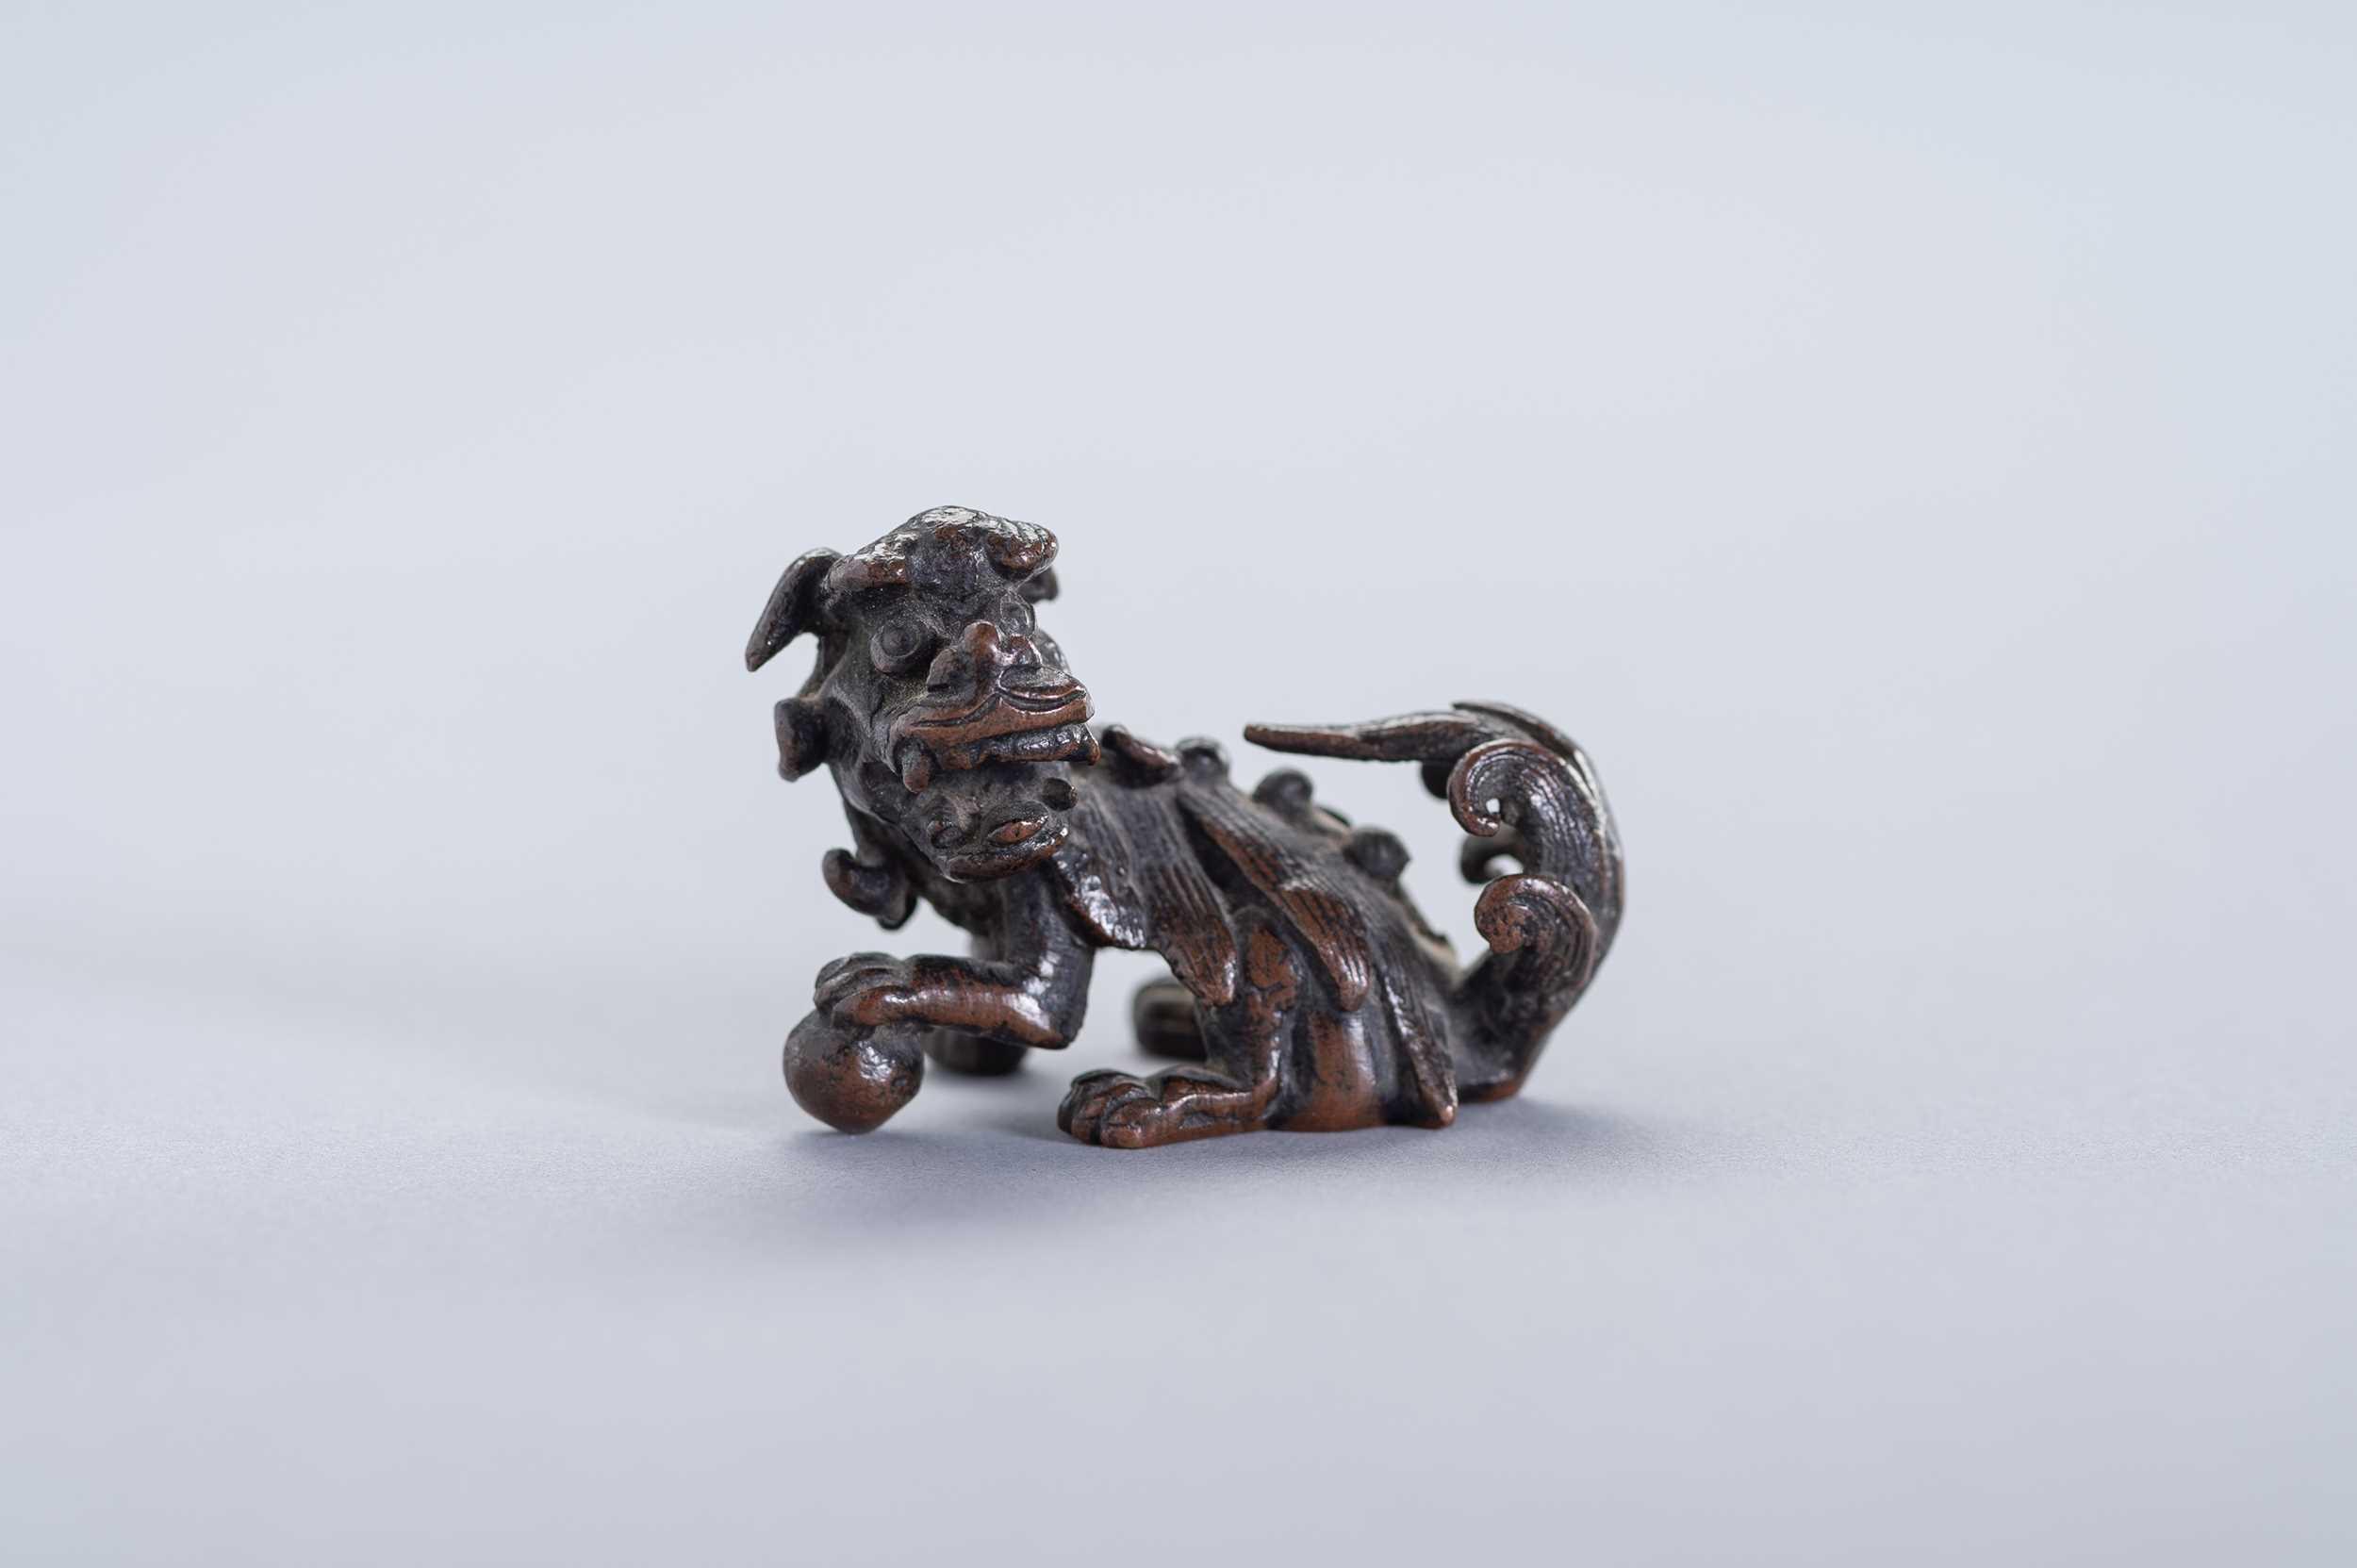 Lot 20 - A MINIATURE BRONZE FIGURE OF A BUDDHIST LION